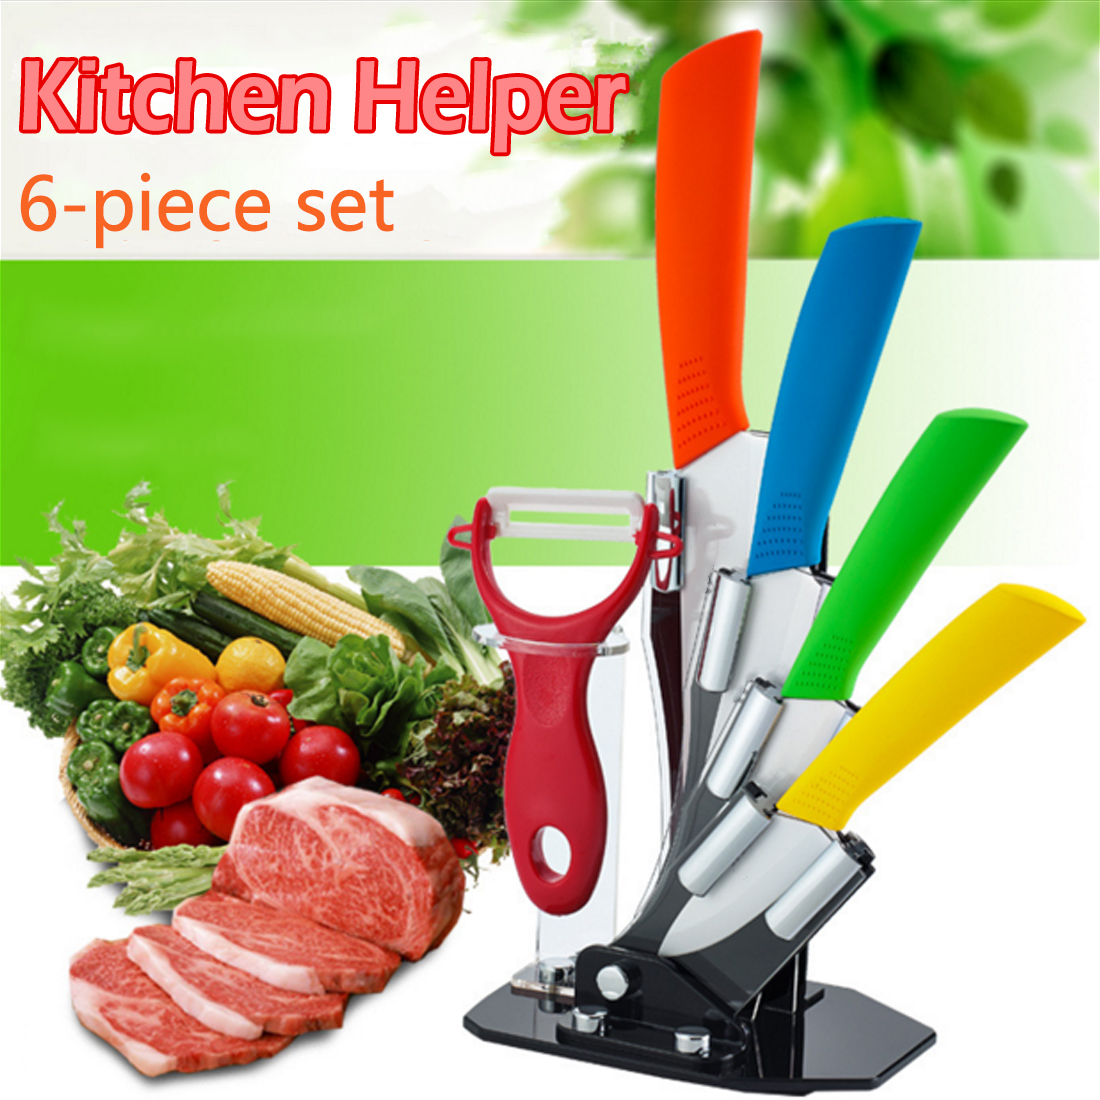 ceramic knife set 3 4 5 6 inch peeler with acrylic knife holder zirconia ceramics blade kitchen knife